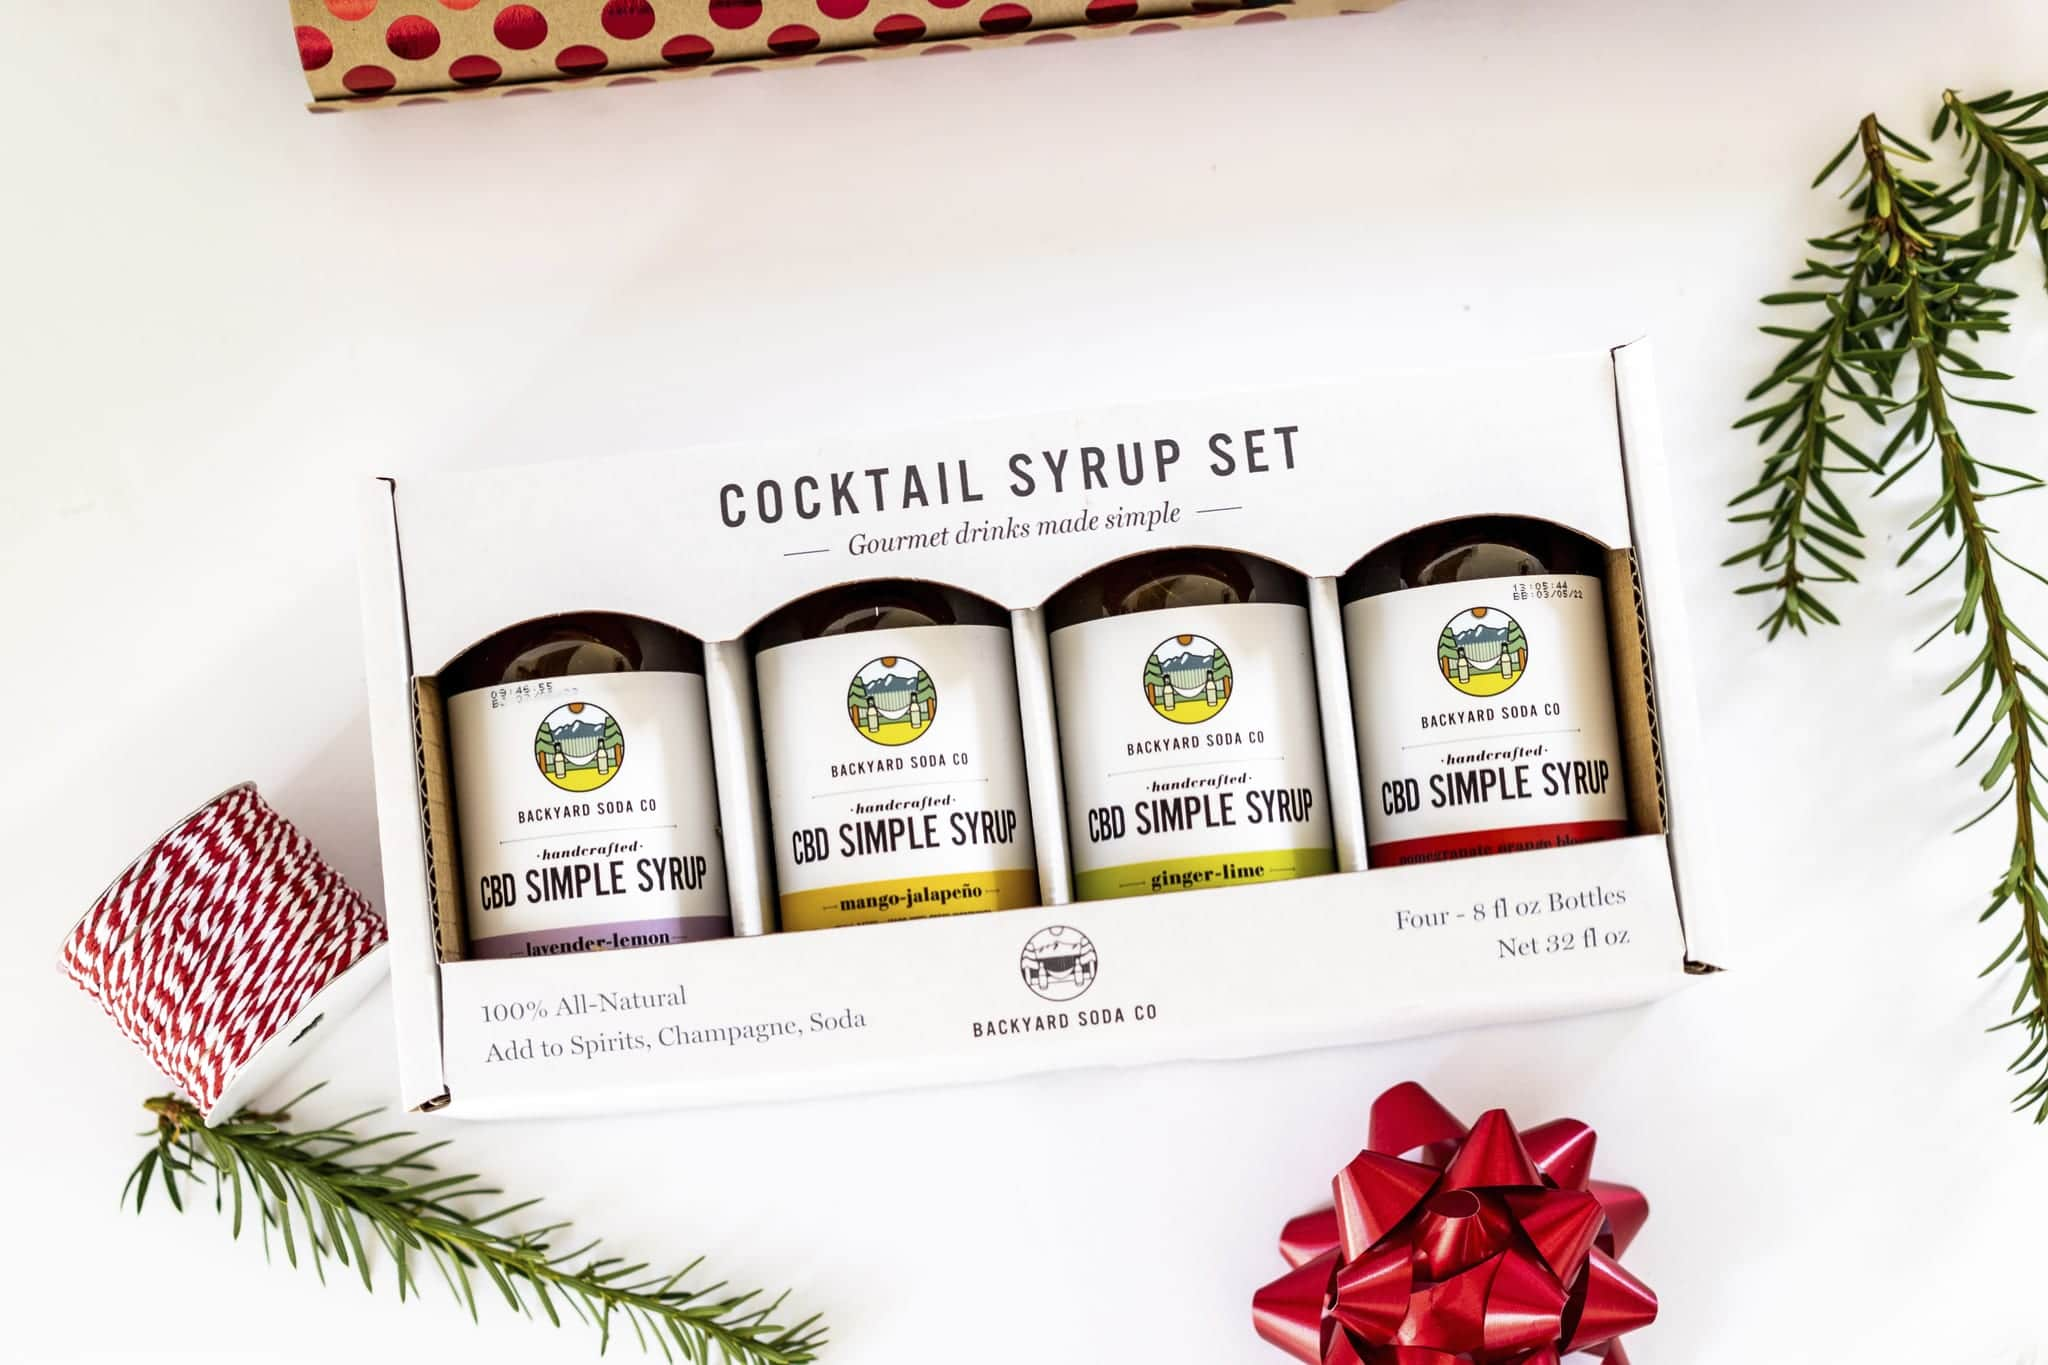 CBD Simple Syrup by Backyard Soda Co. Holiday Gift Set